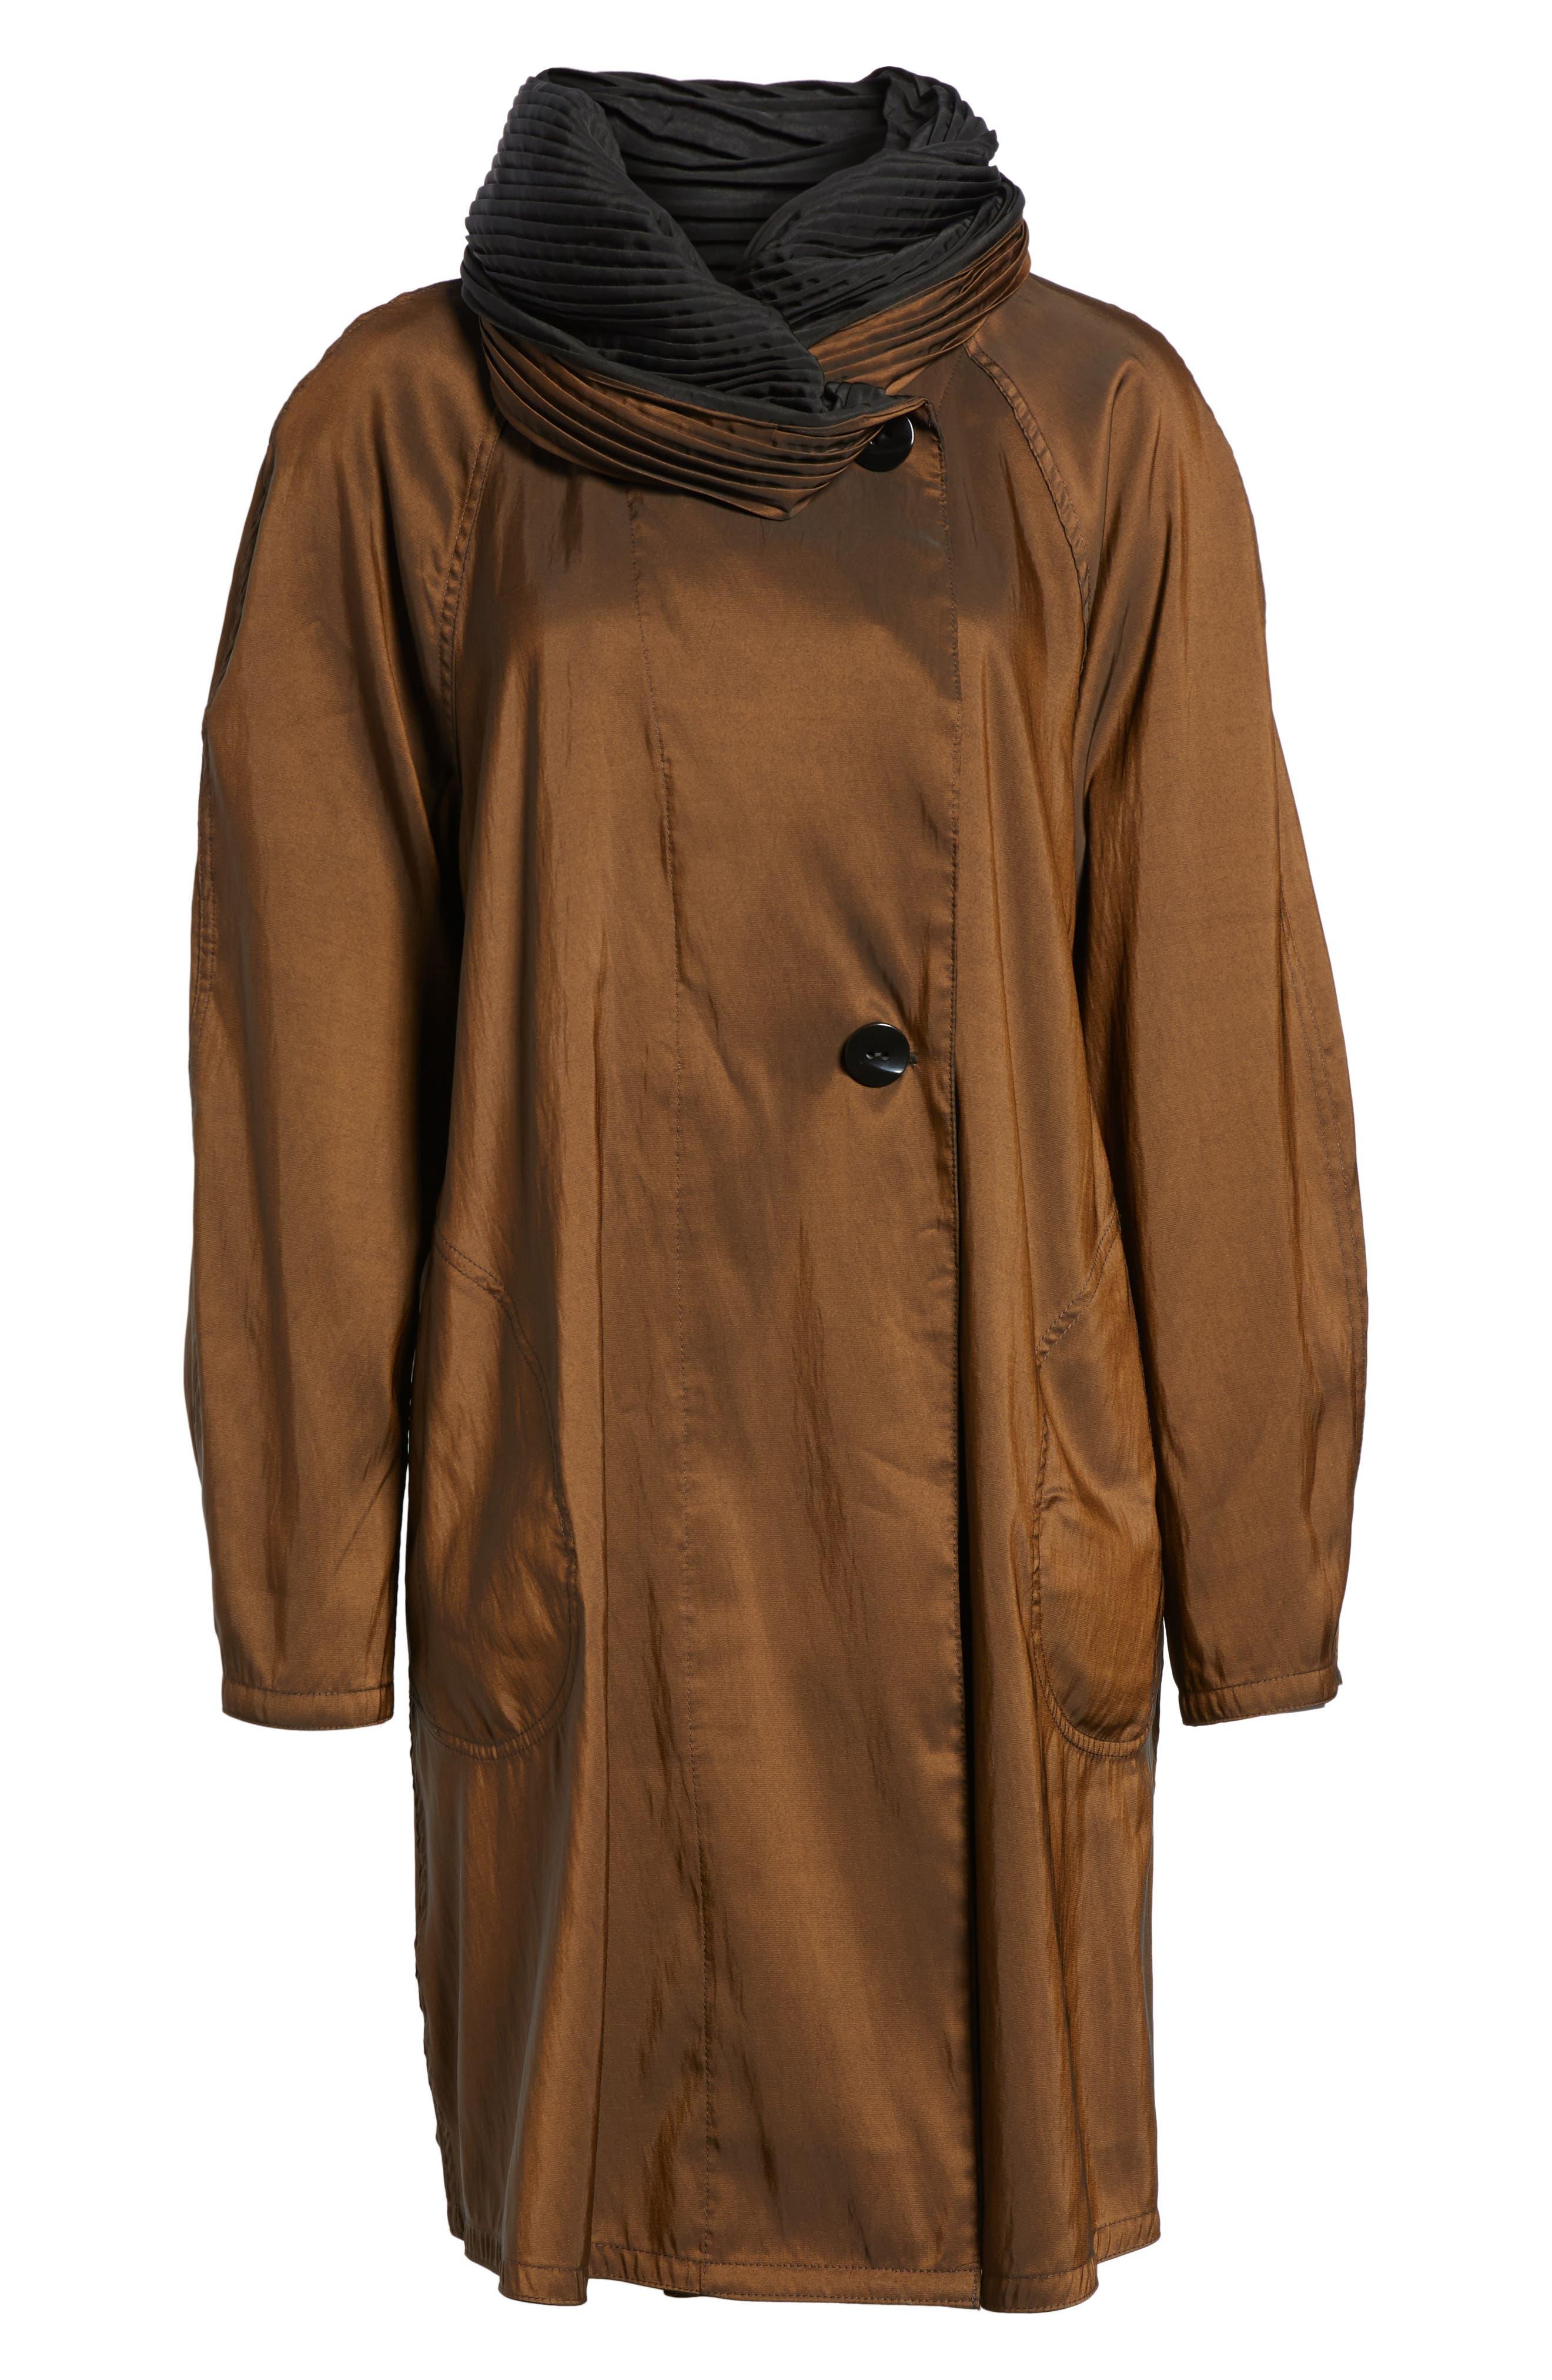 Reversible Pleat Hood Packable Travel Coat,                             Main thumbnail 1, color,                             Bronze/ Black